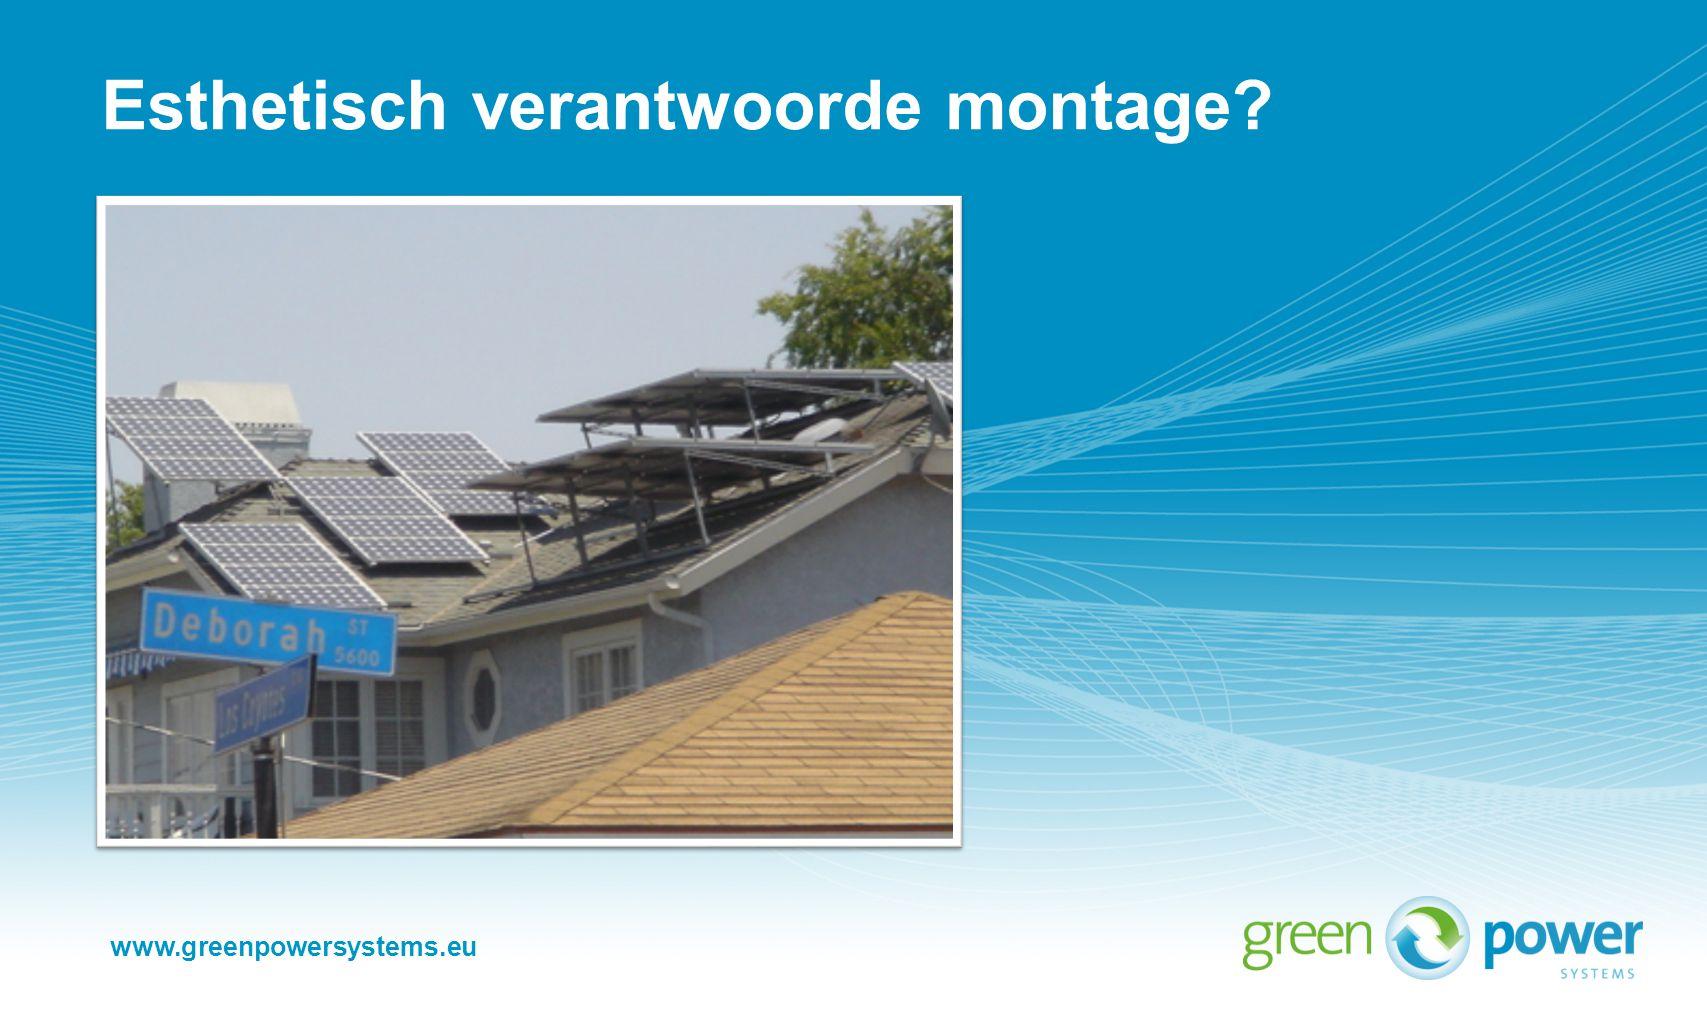 www.greenpowersystems.eu Esthetisch verantwoorde montage?